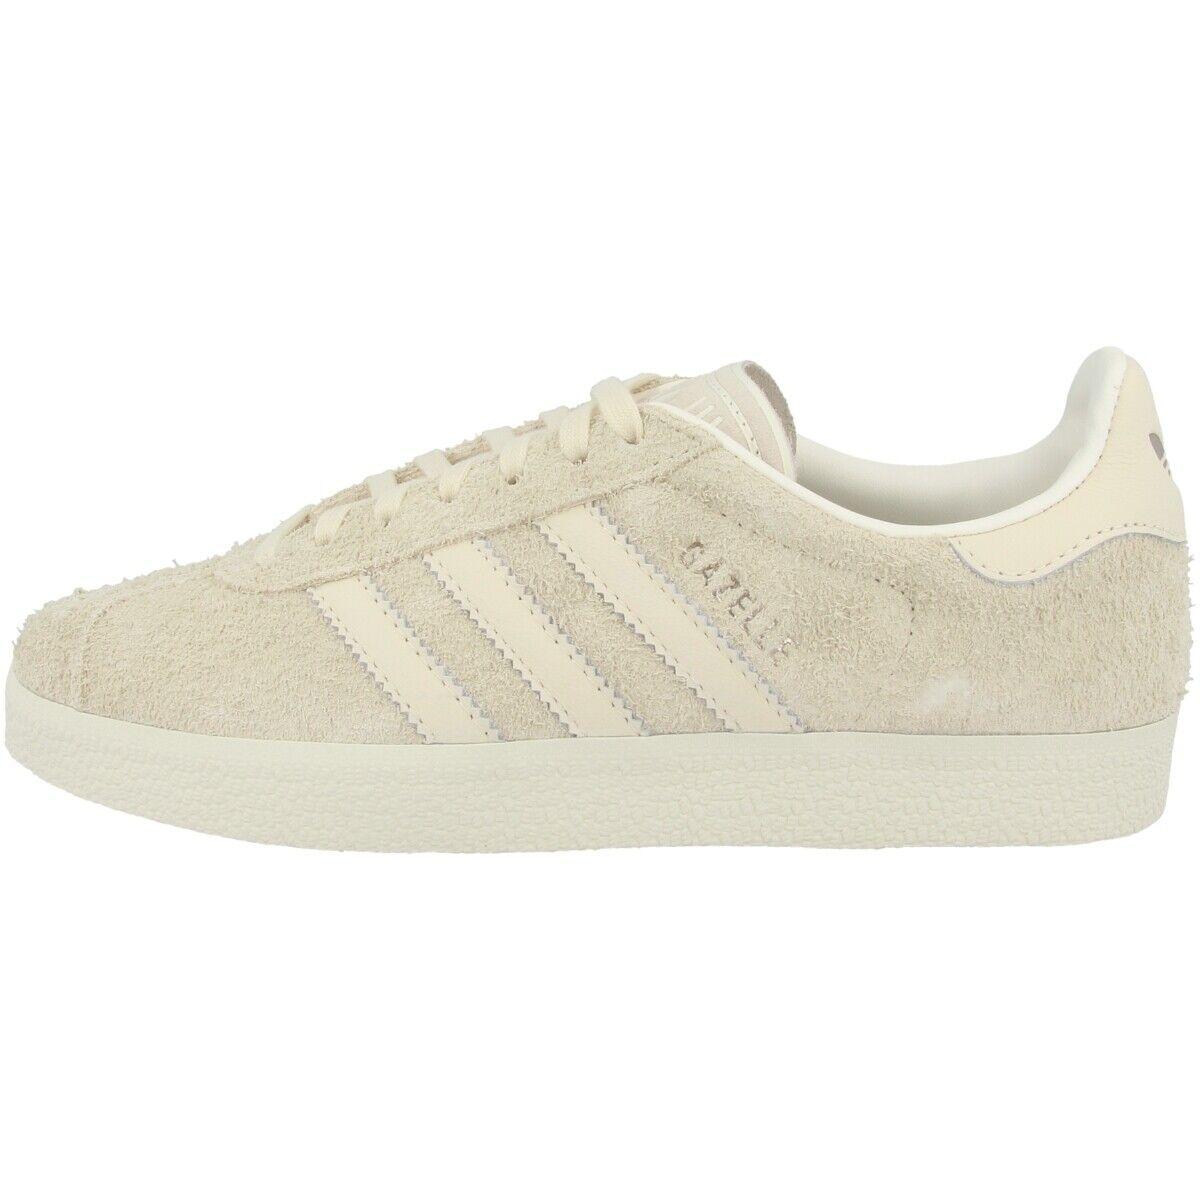 Adidas GAZELLE Woes scarpe donna Originals Casual  Trainers Ecru Tint EE550  essere molto richiesto